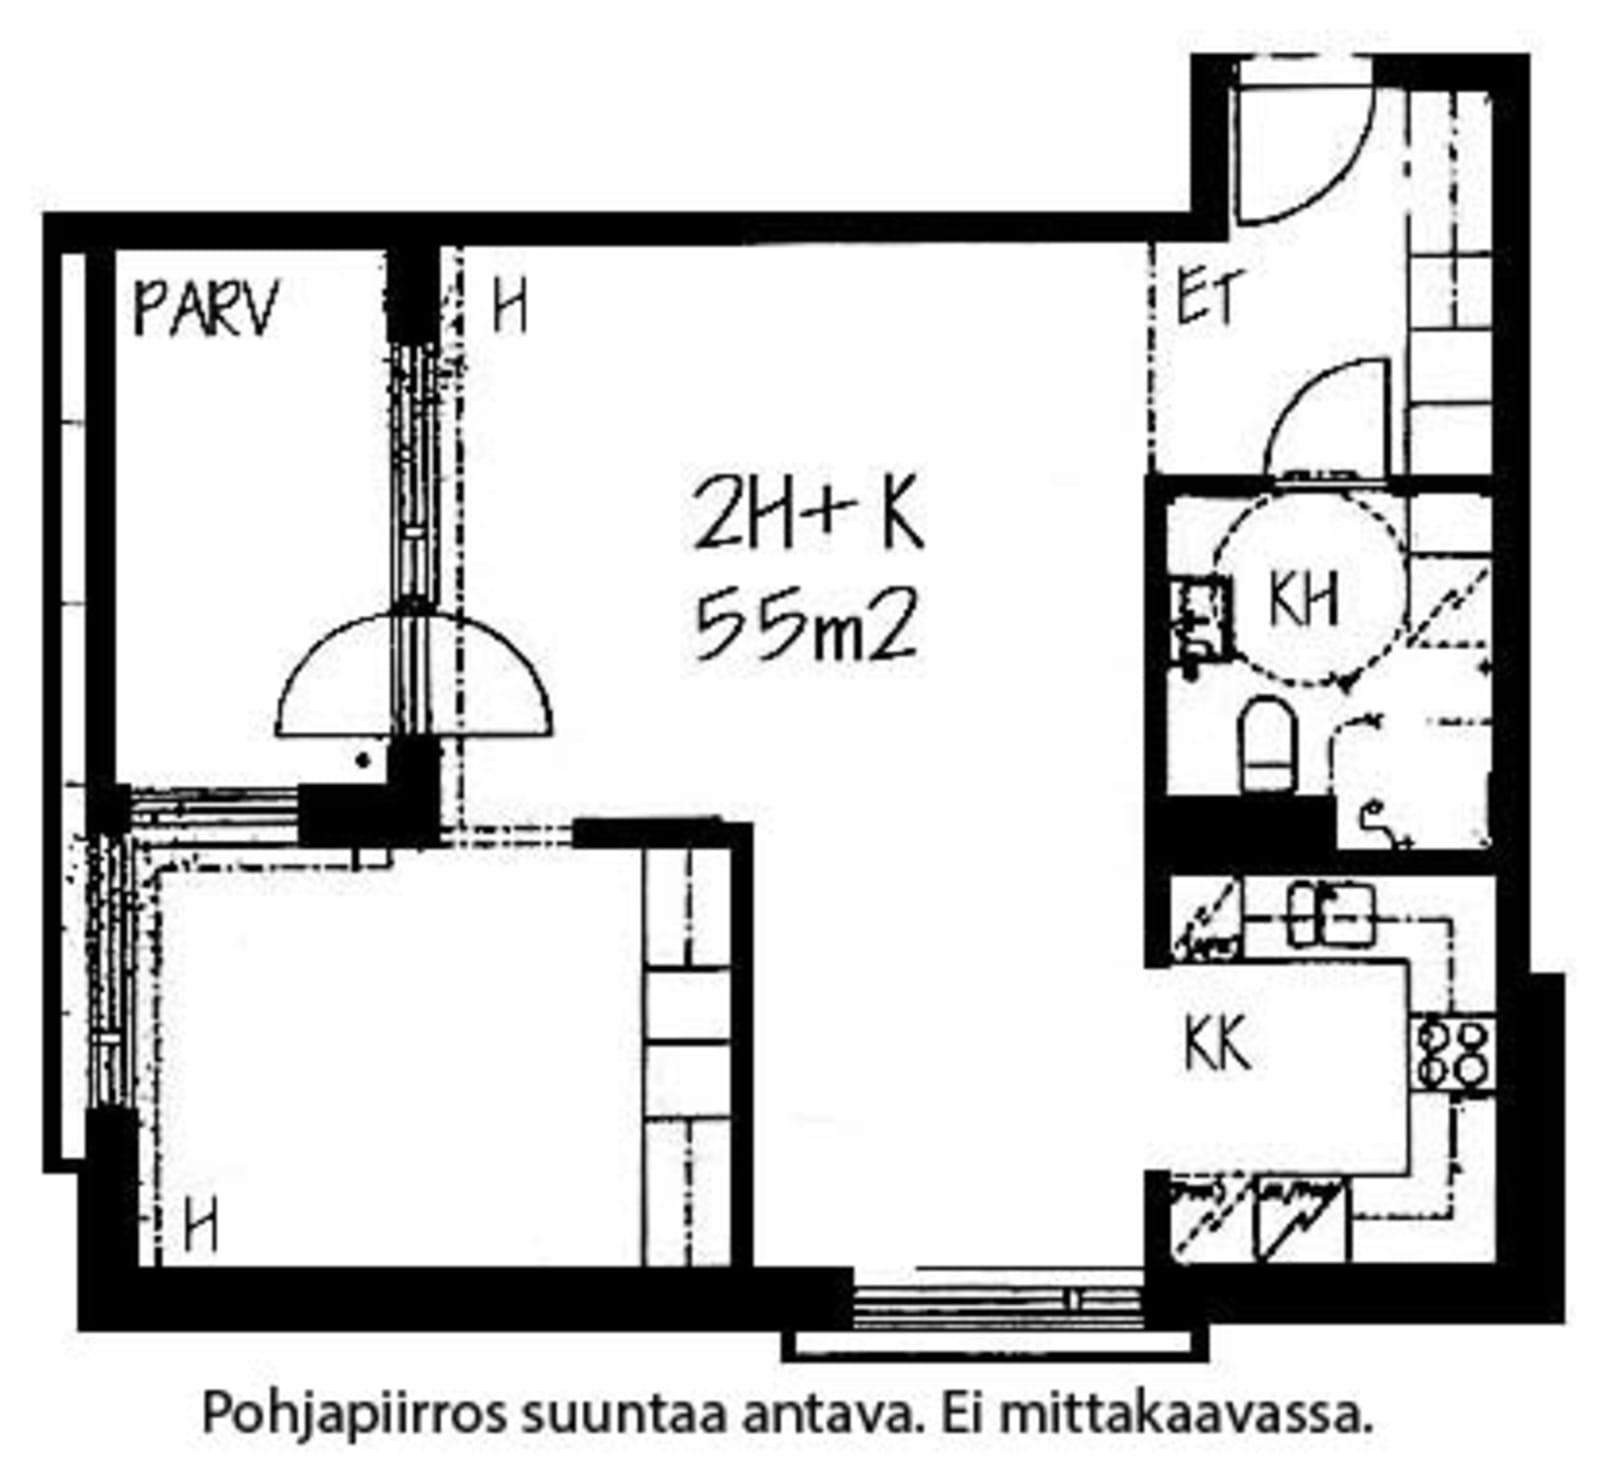 Helsinki, Herttoniemi, Laivalahdenportti 5 A 015